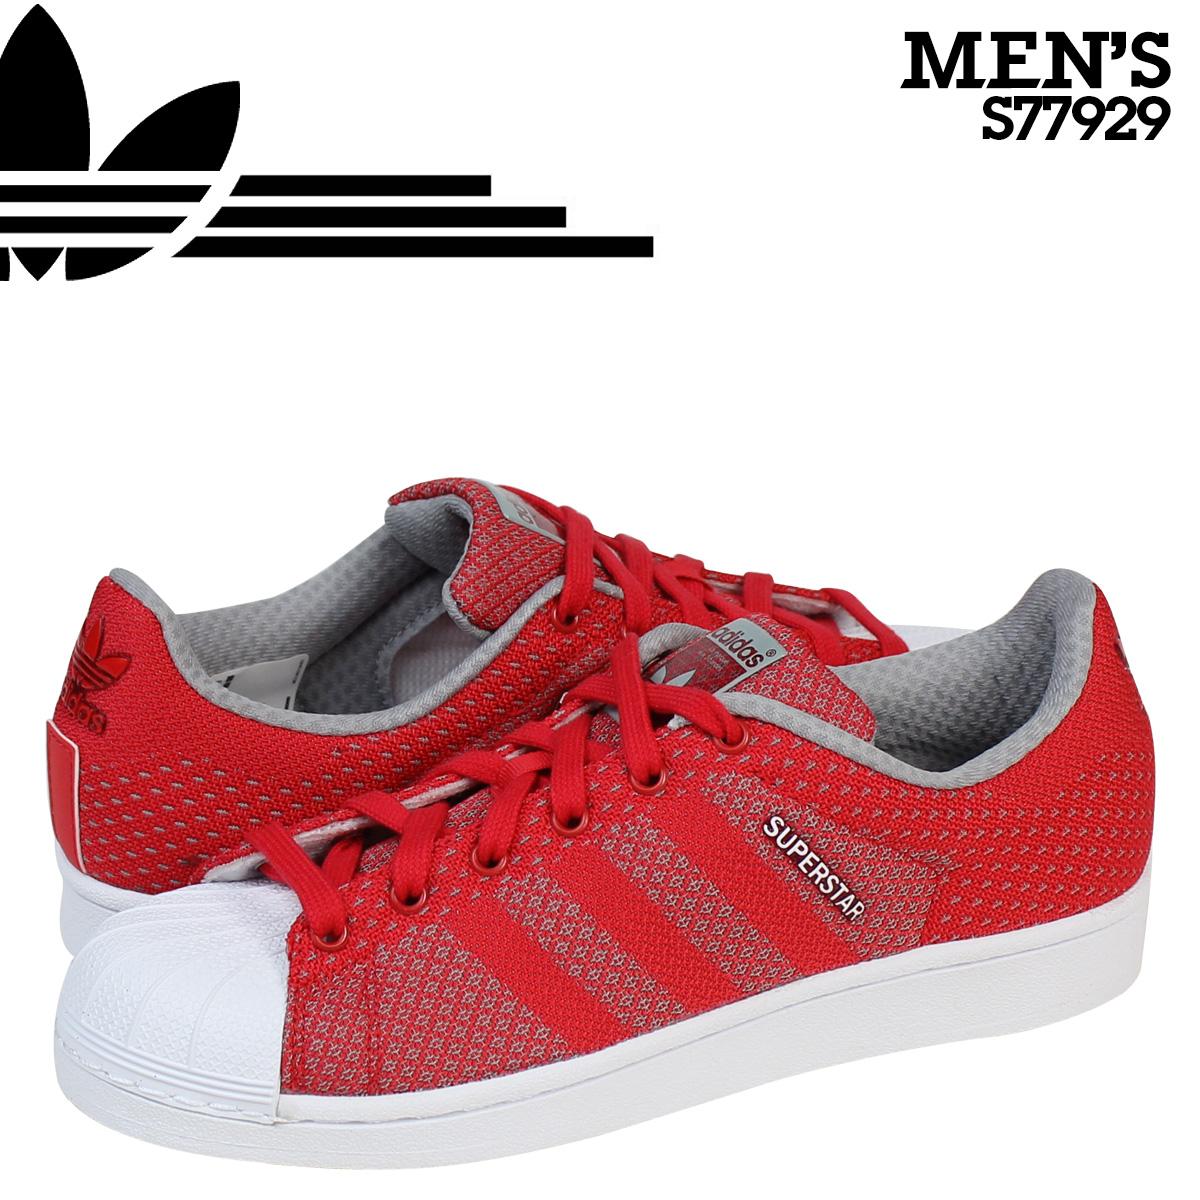 Adidas originals adidas Originals mens Womens SUPERSTAR WEAVE sneakers  Super Star weave S77929 Red [9/4 new in stock]